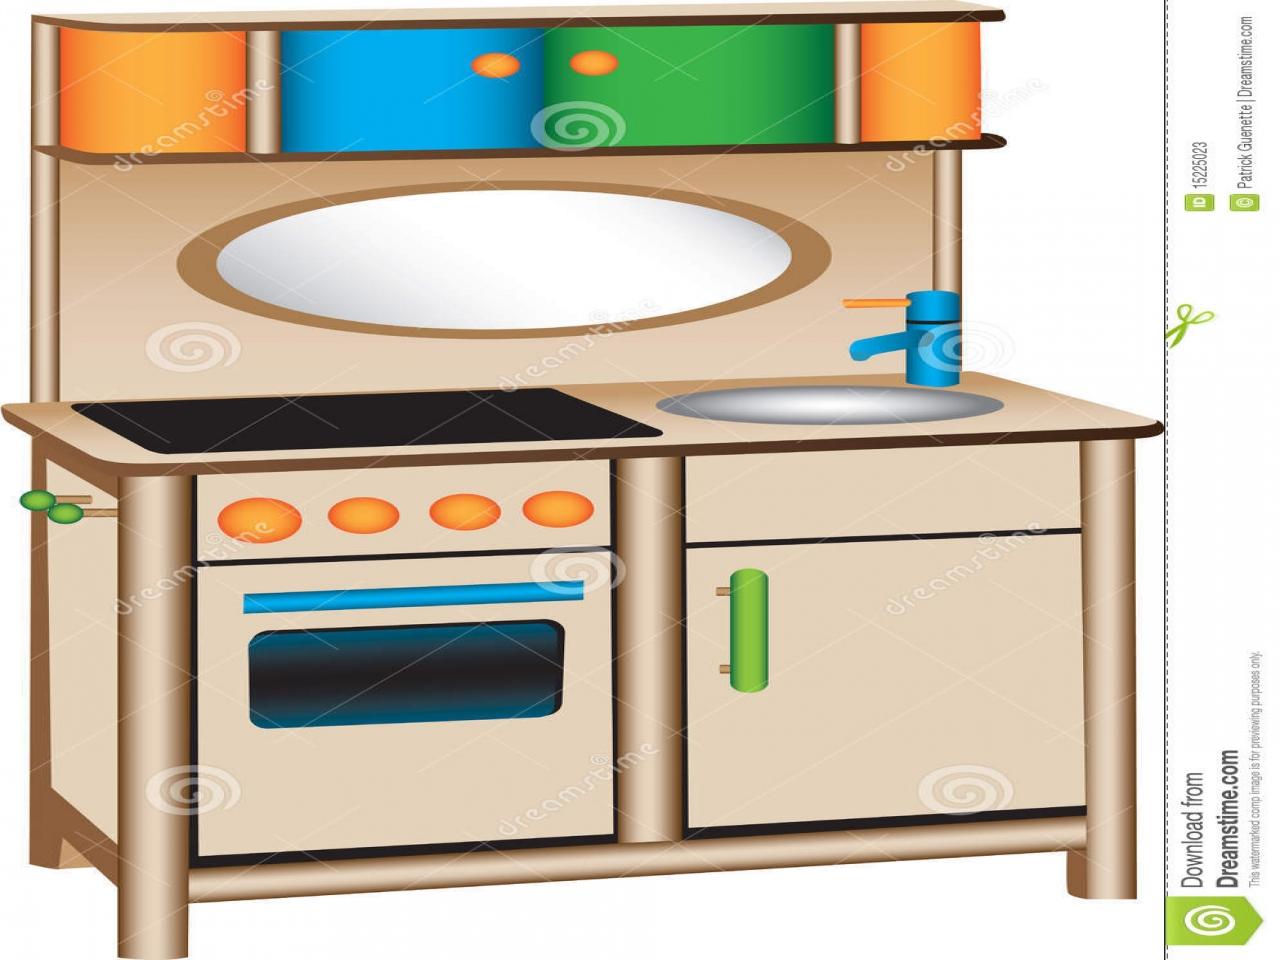 1280x960 Kitchen Clipart Classroom Centers